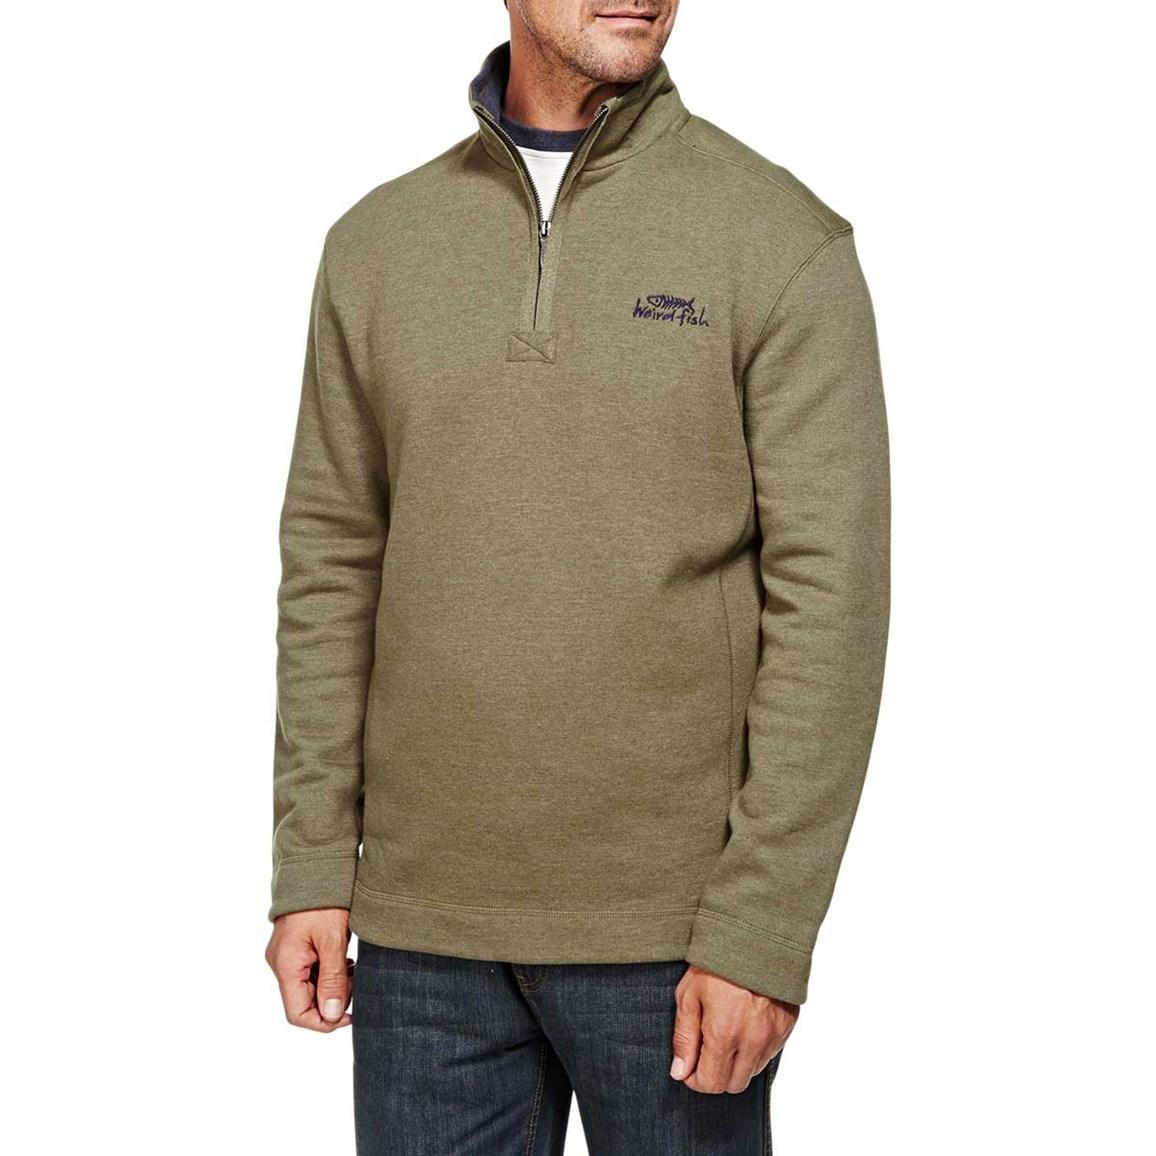 Hail Plain 1/4 Neck Zip Embroidered Sweatshirt Olive Night